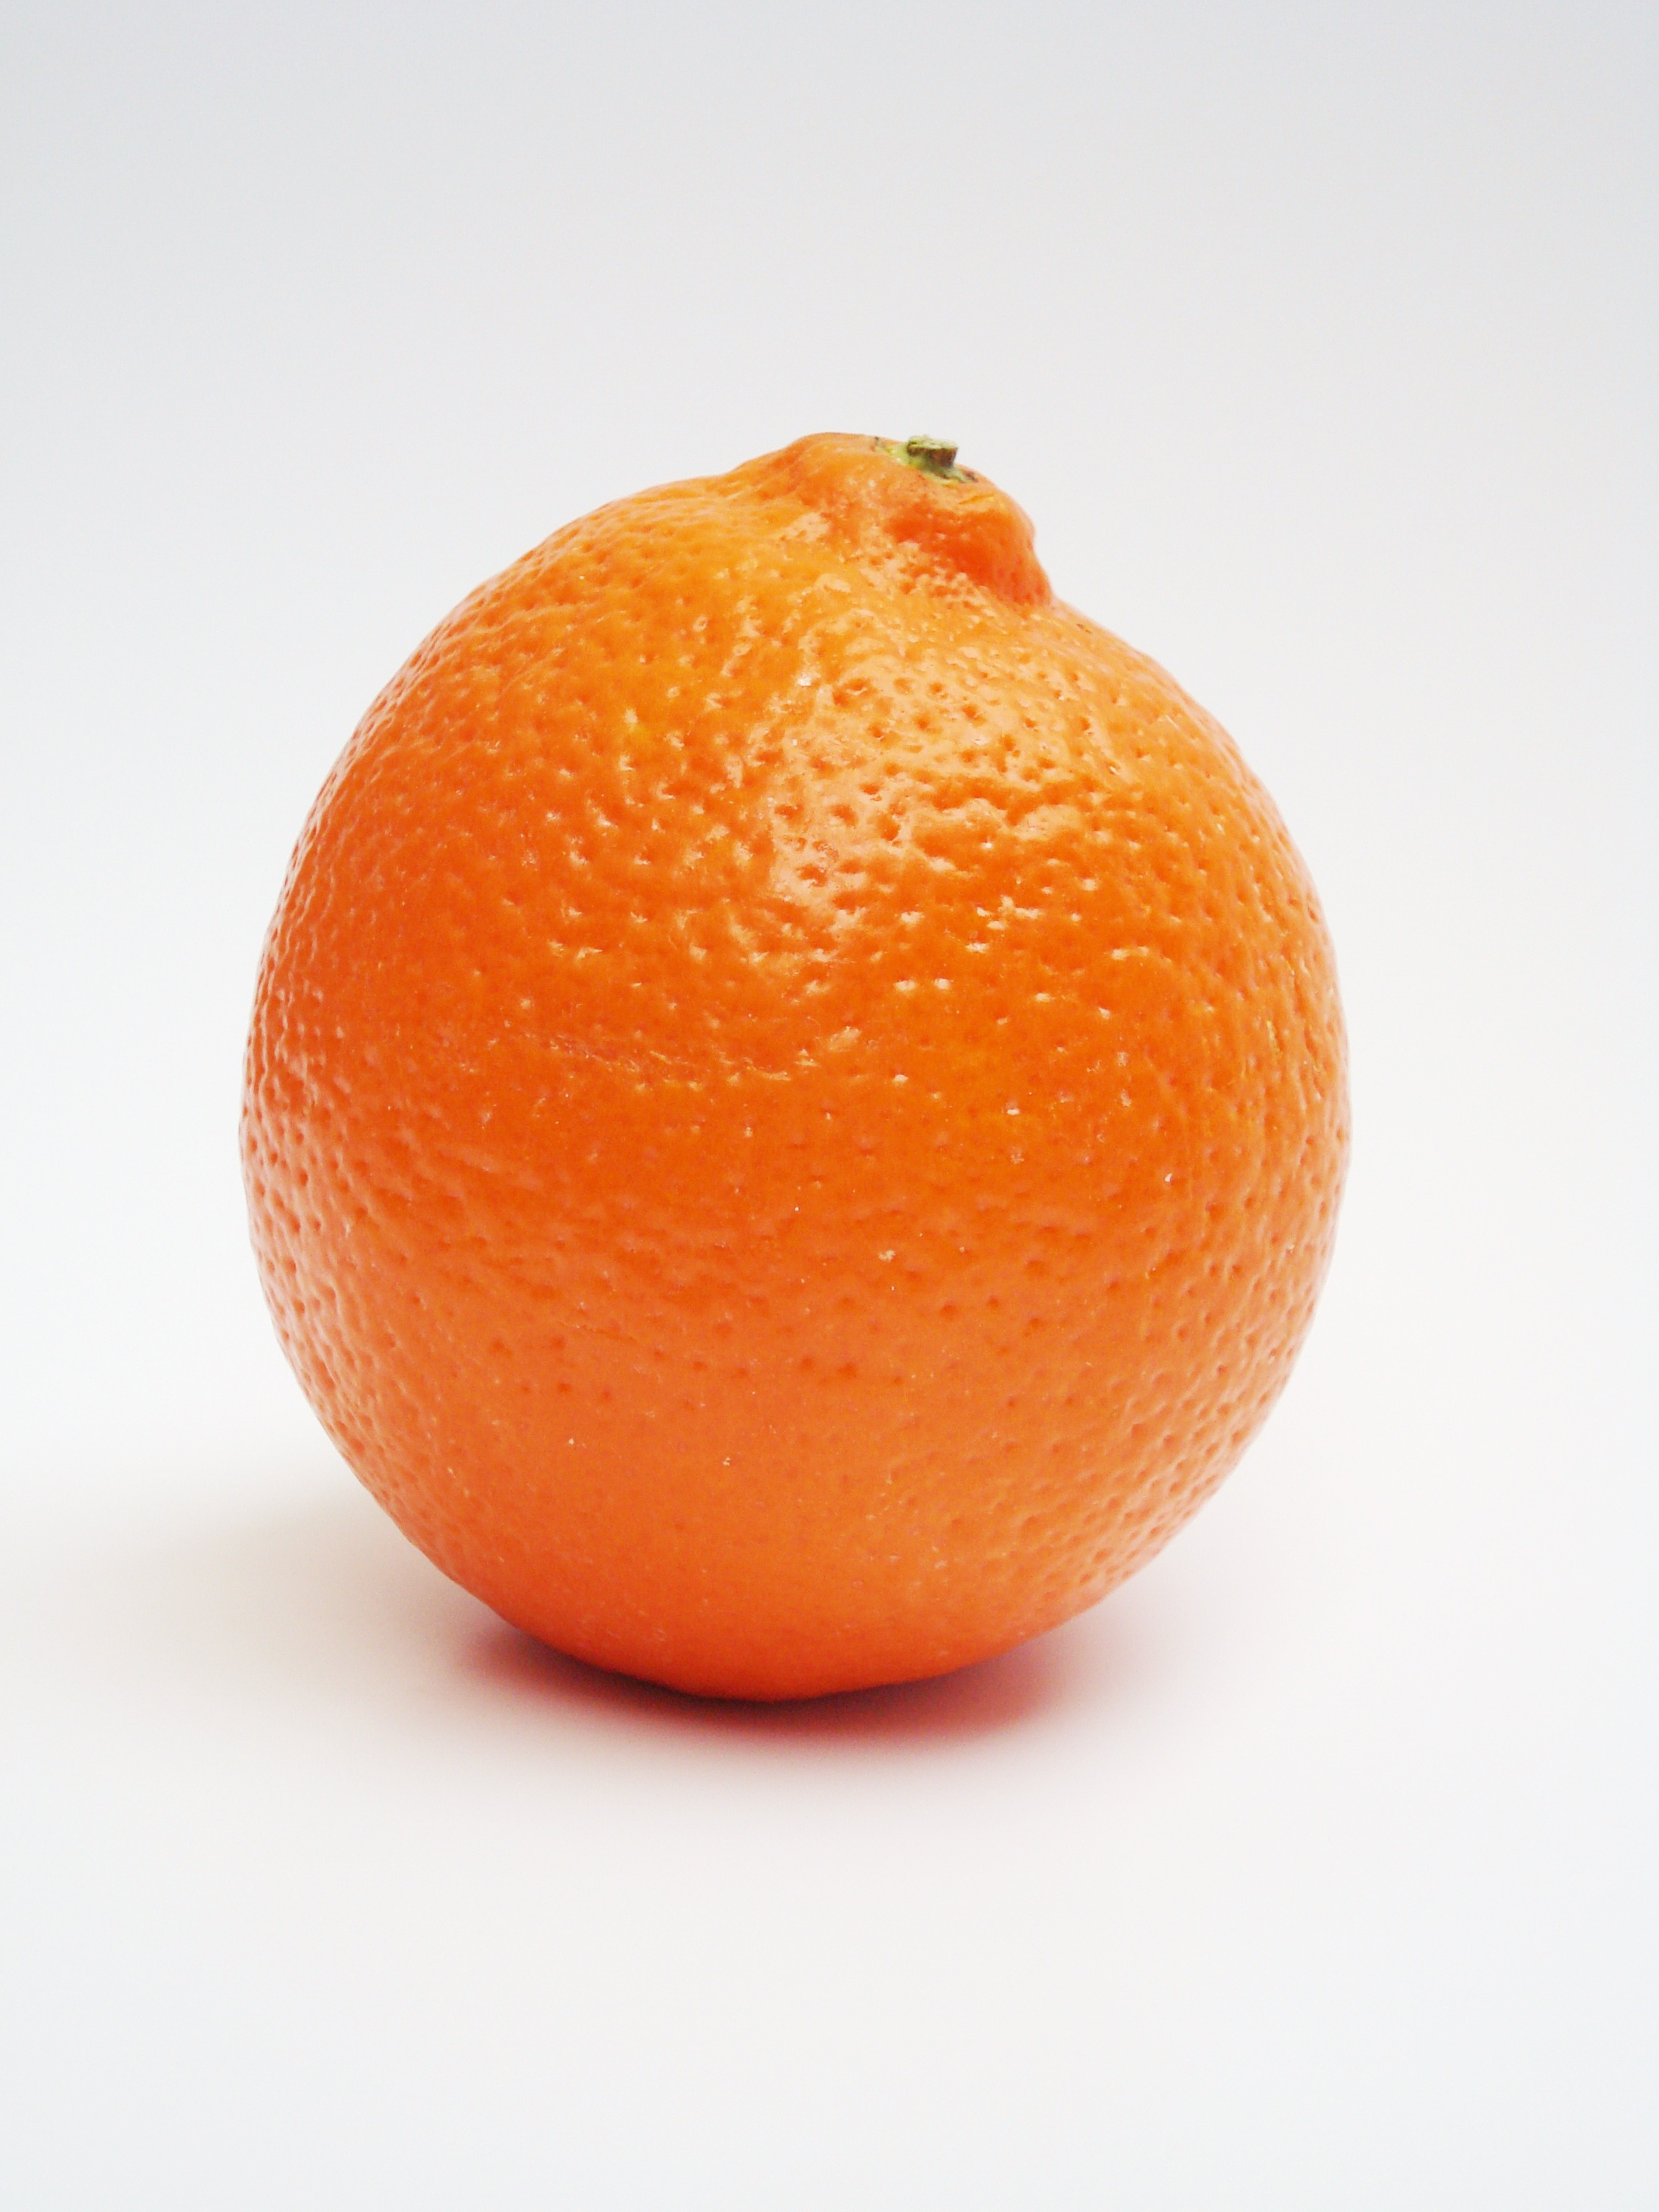 minneola-citrus-fruit-grapefruit-74300.jpg